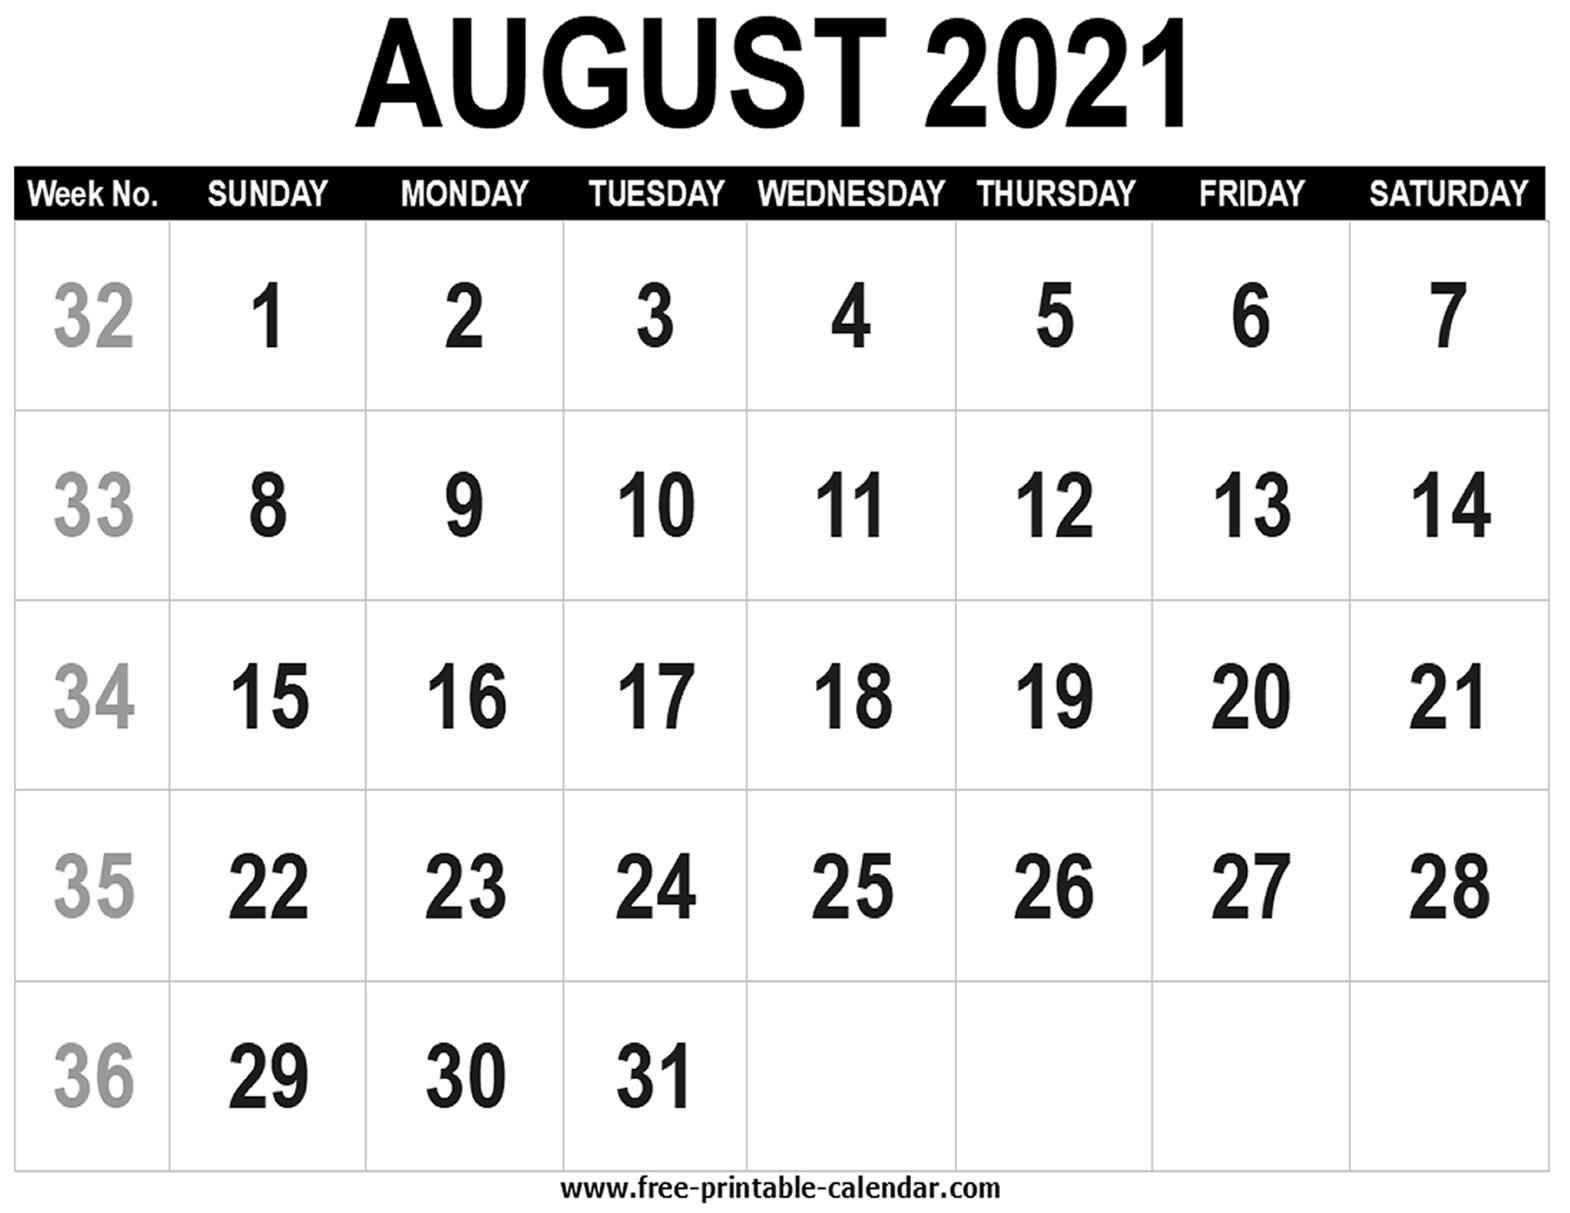 blank calendar 2021 august free printable calendar